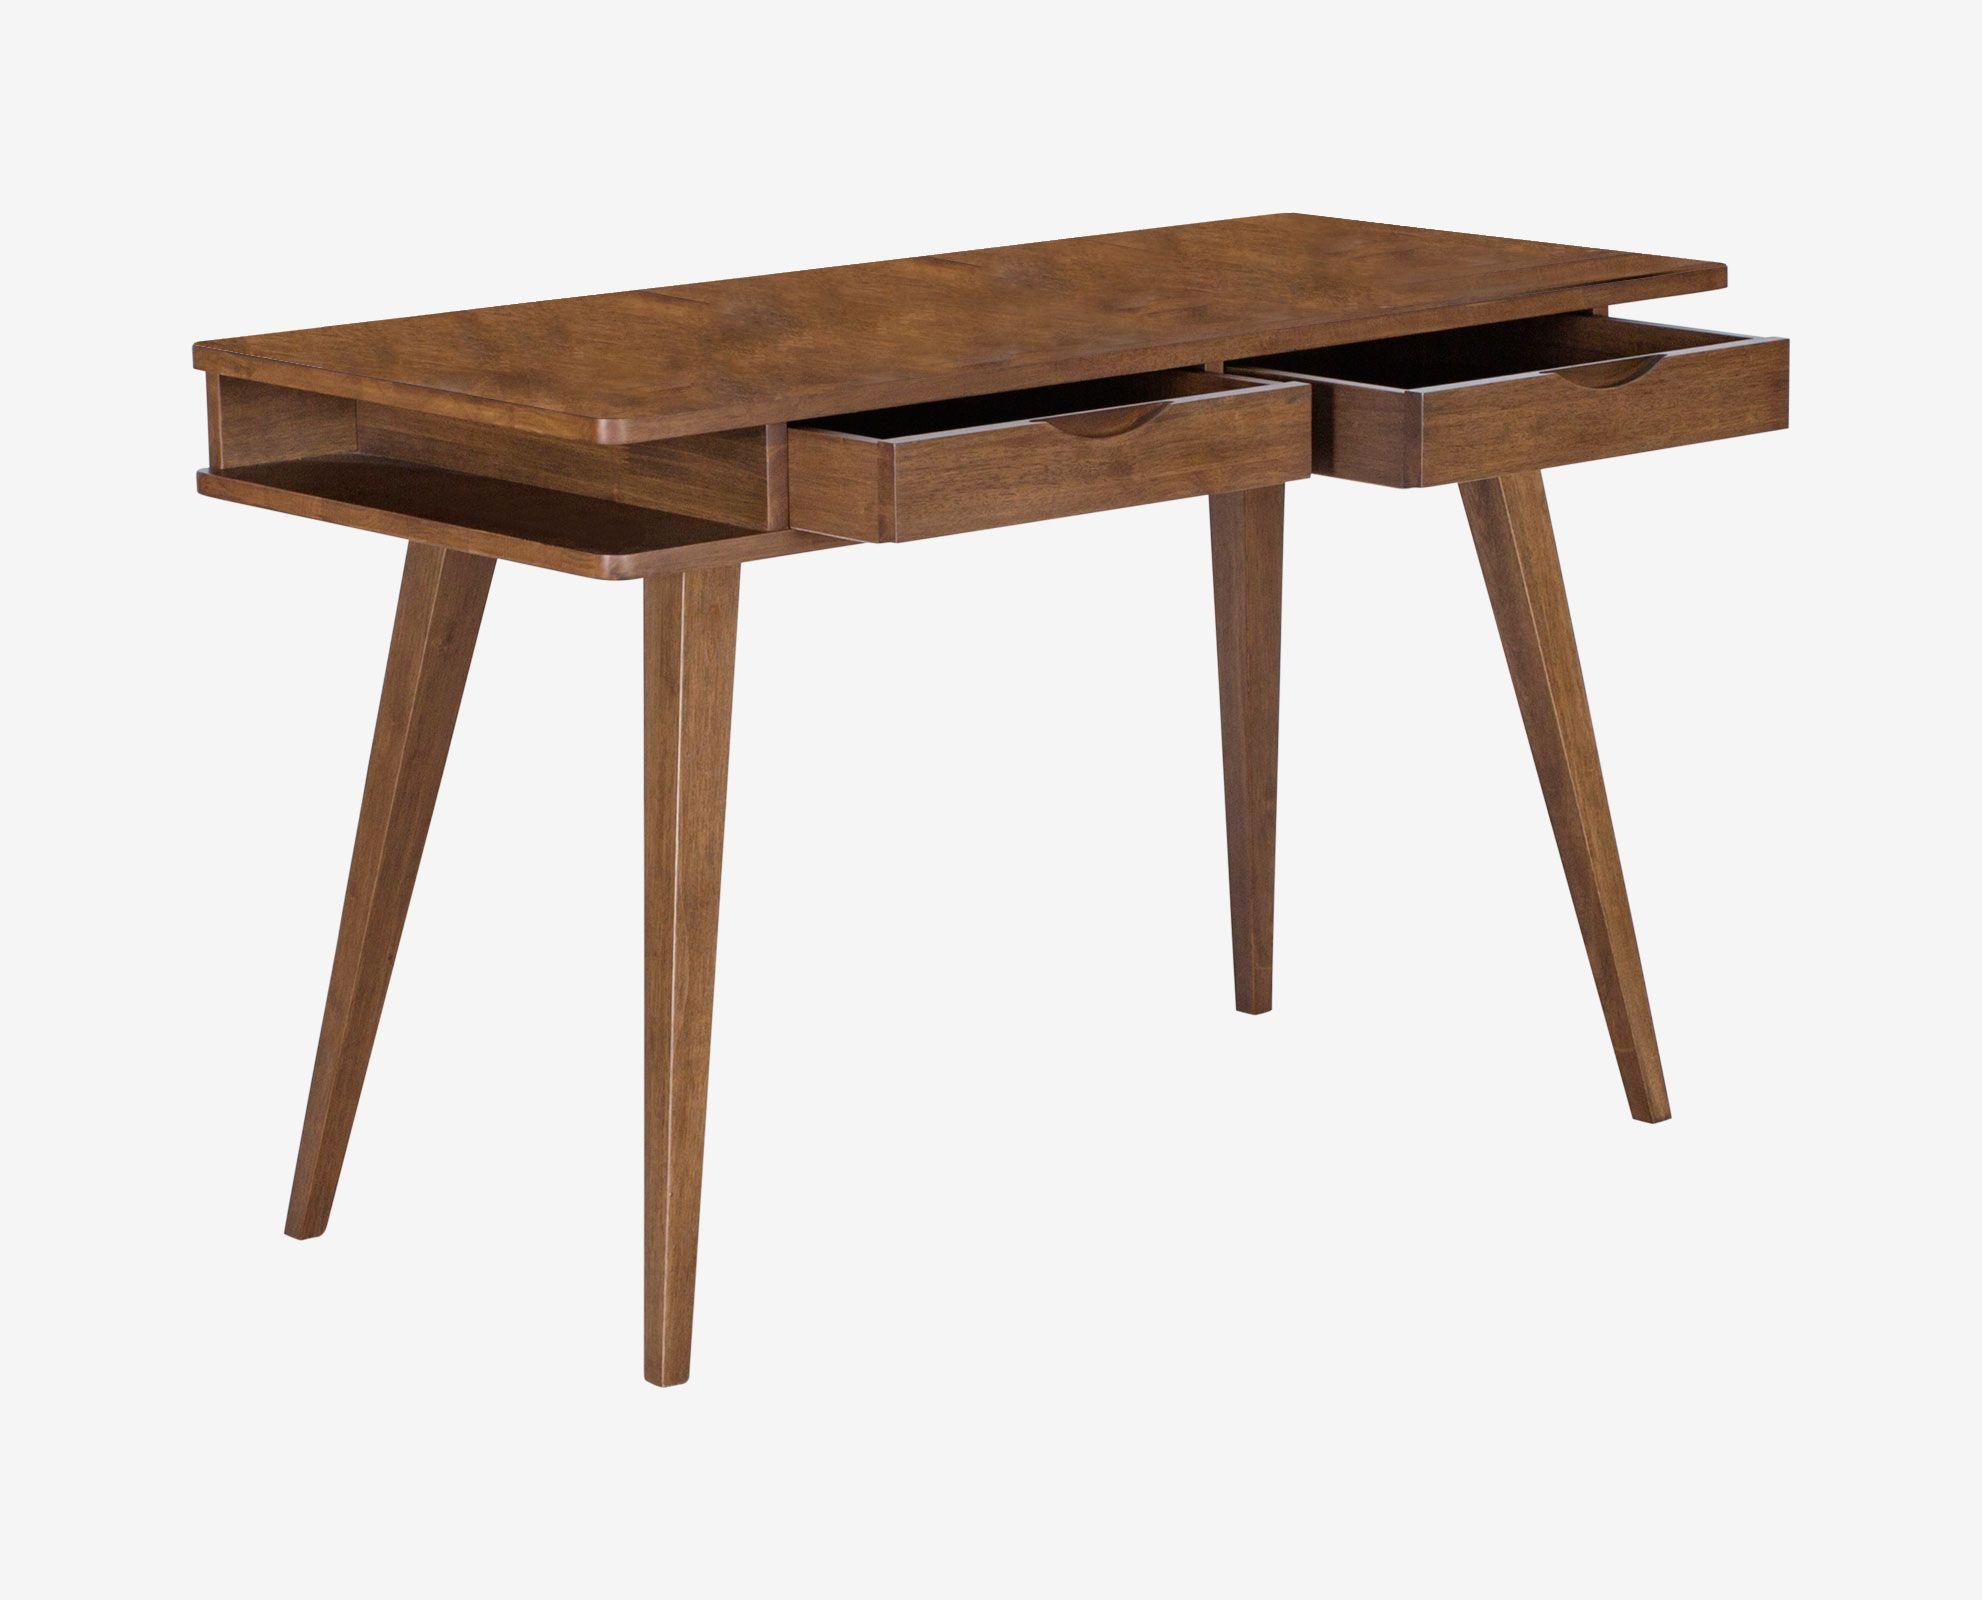 Arbete Desk Desks Scandinavian Designs Scandinavian Design Desk Furniture Desk With Drawers